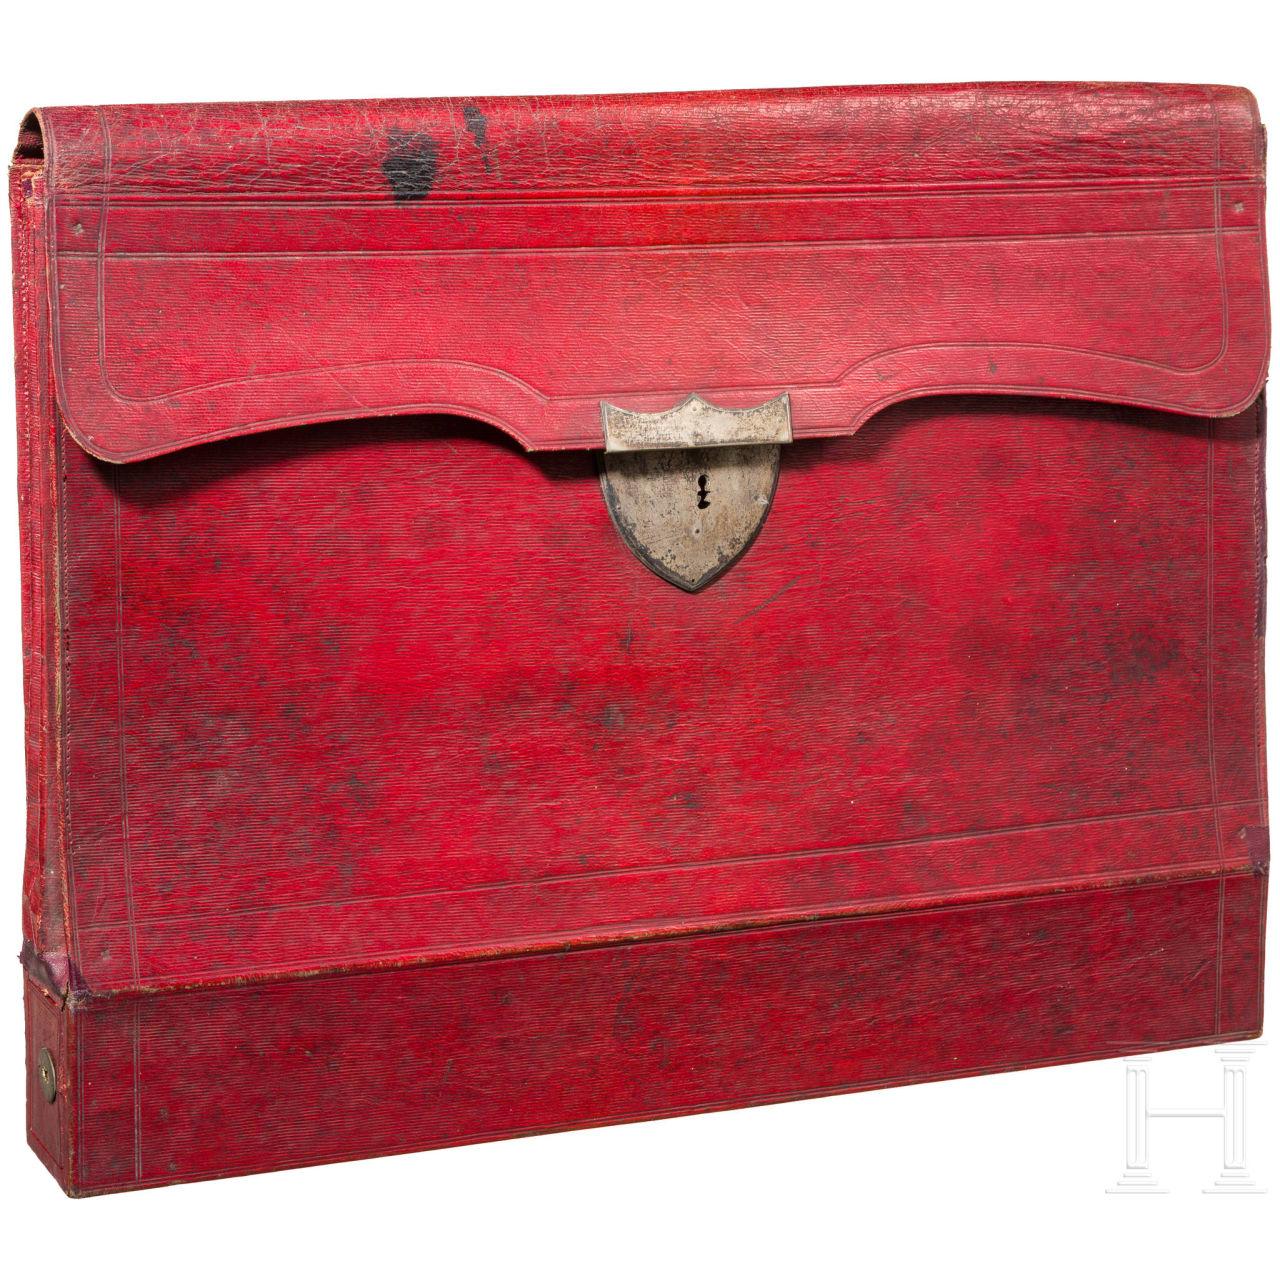 Dokumententasche aus rotem Leder, mglw. Russland, 1. Drittel 19. Jhdt.